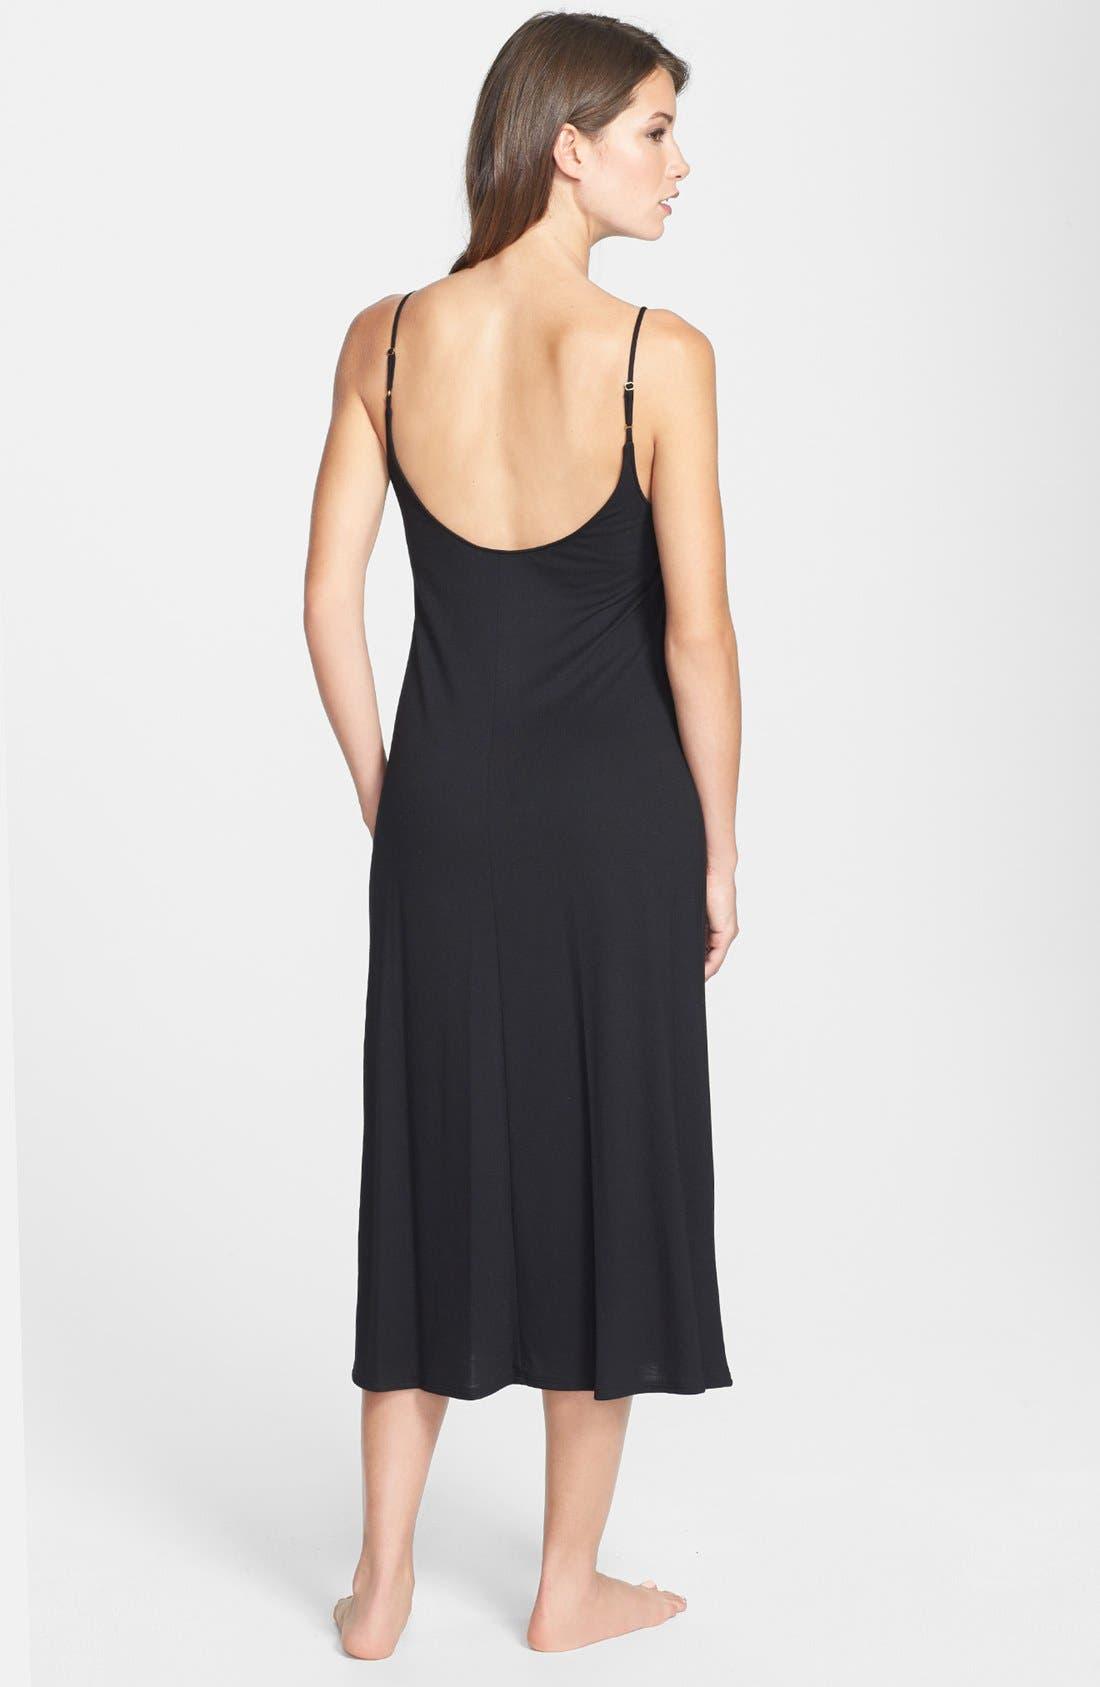 Shangri La Nightgown,                             Alternate thumbnail 8, color,                             BLACK